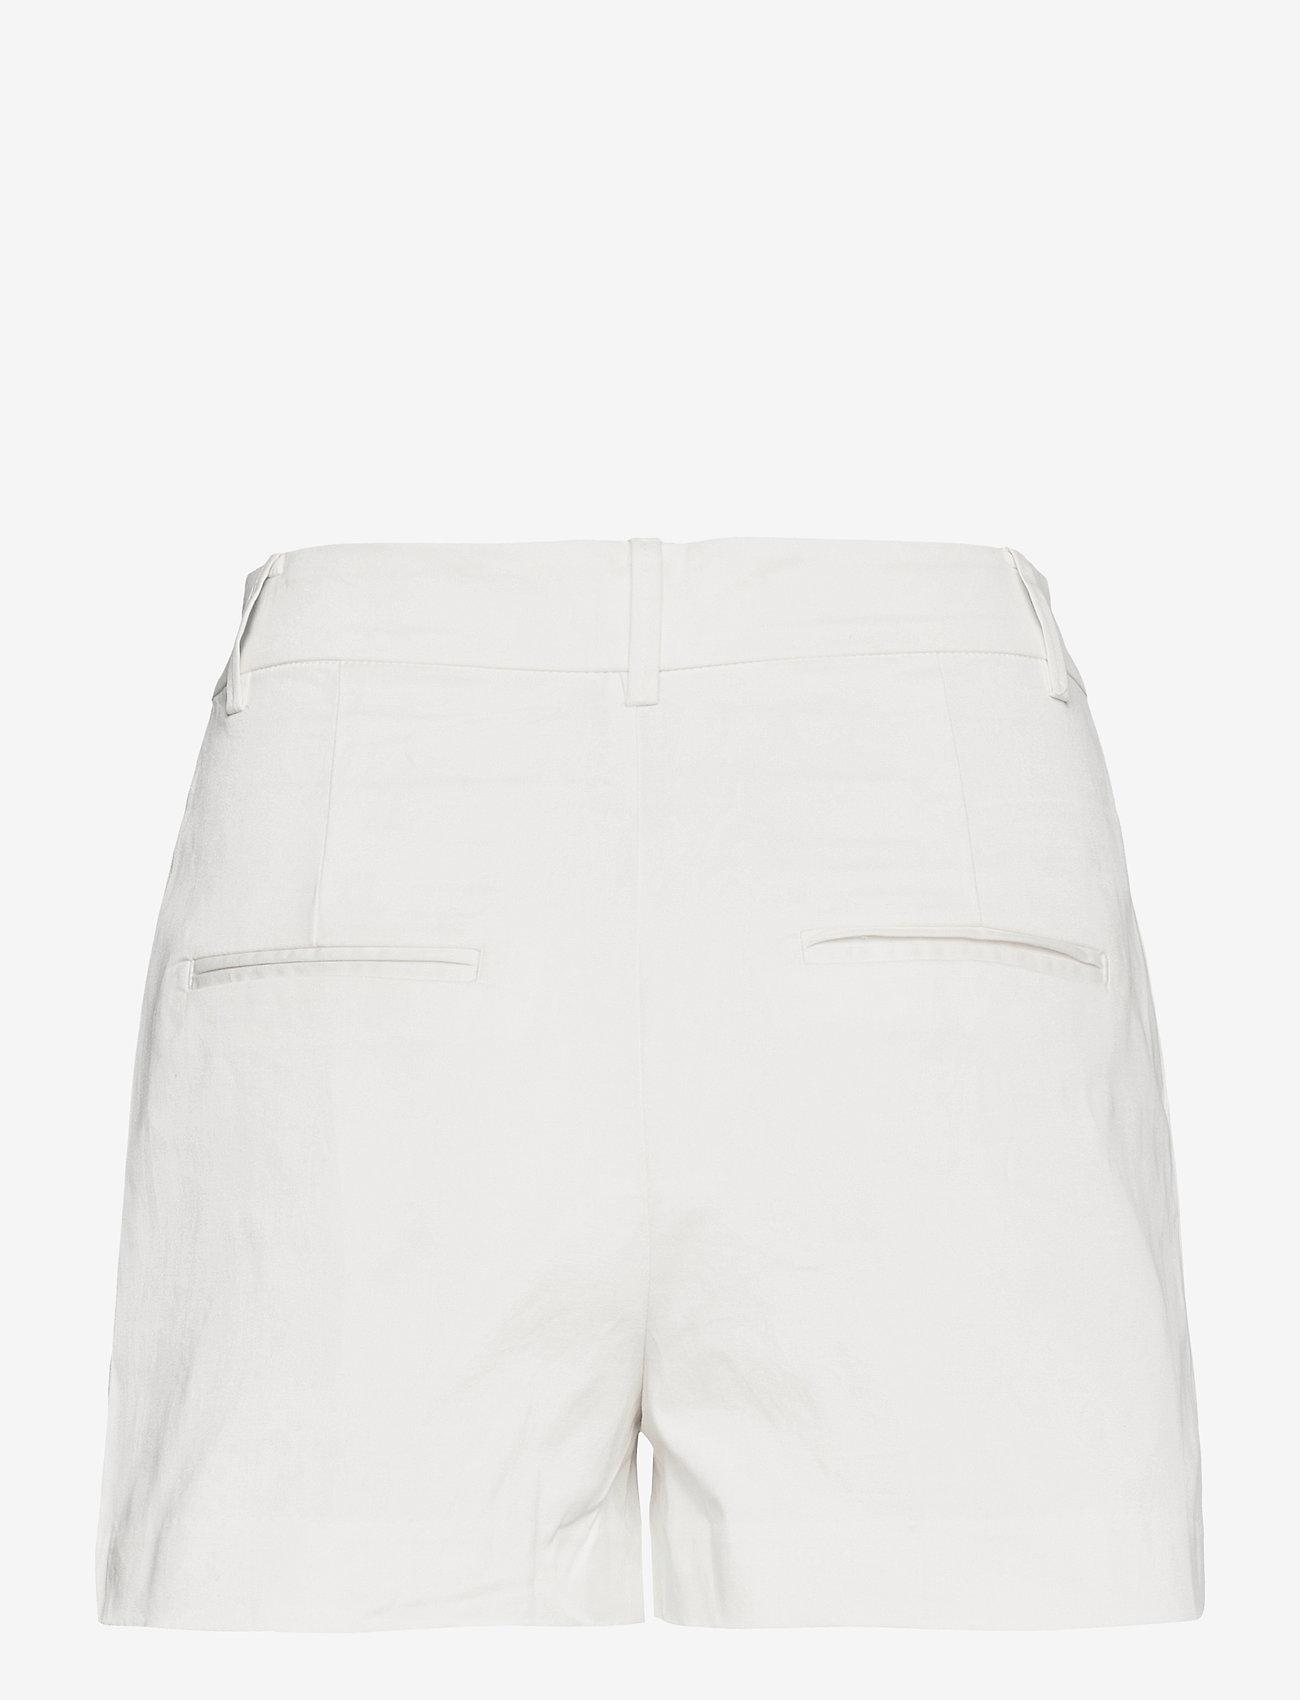 Mango - CHINO - chino shorts - offwhite - 1